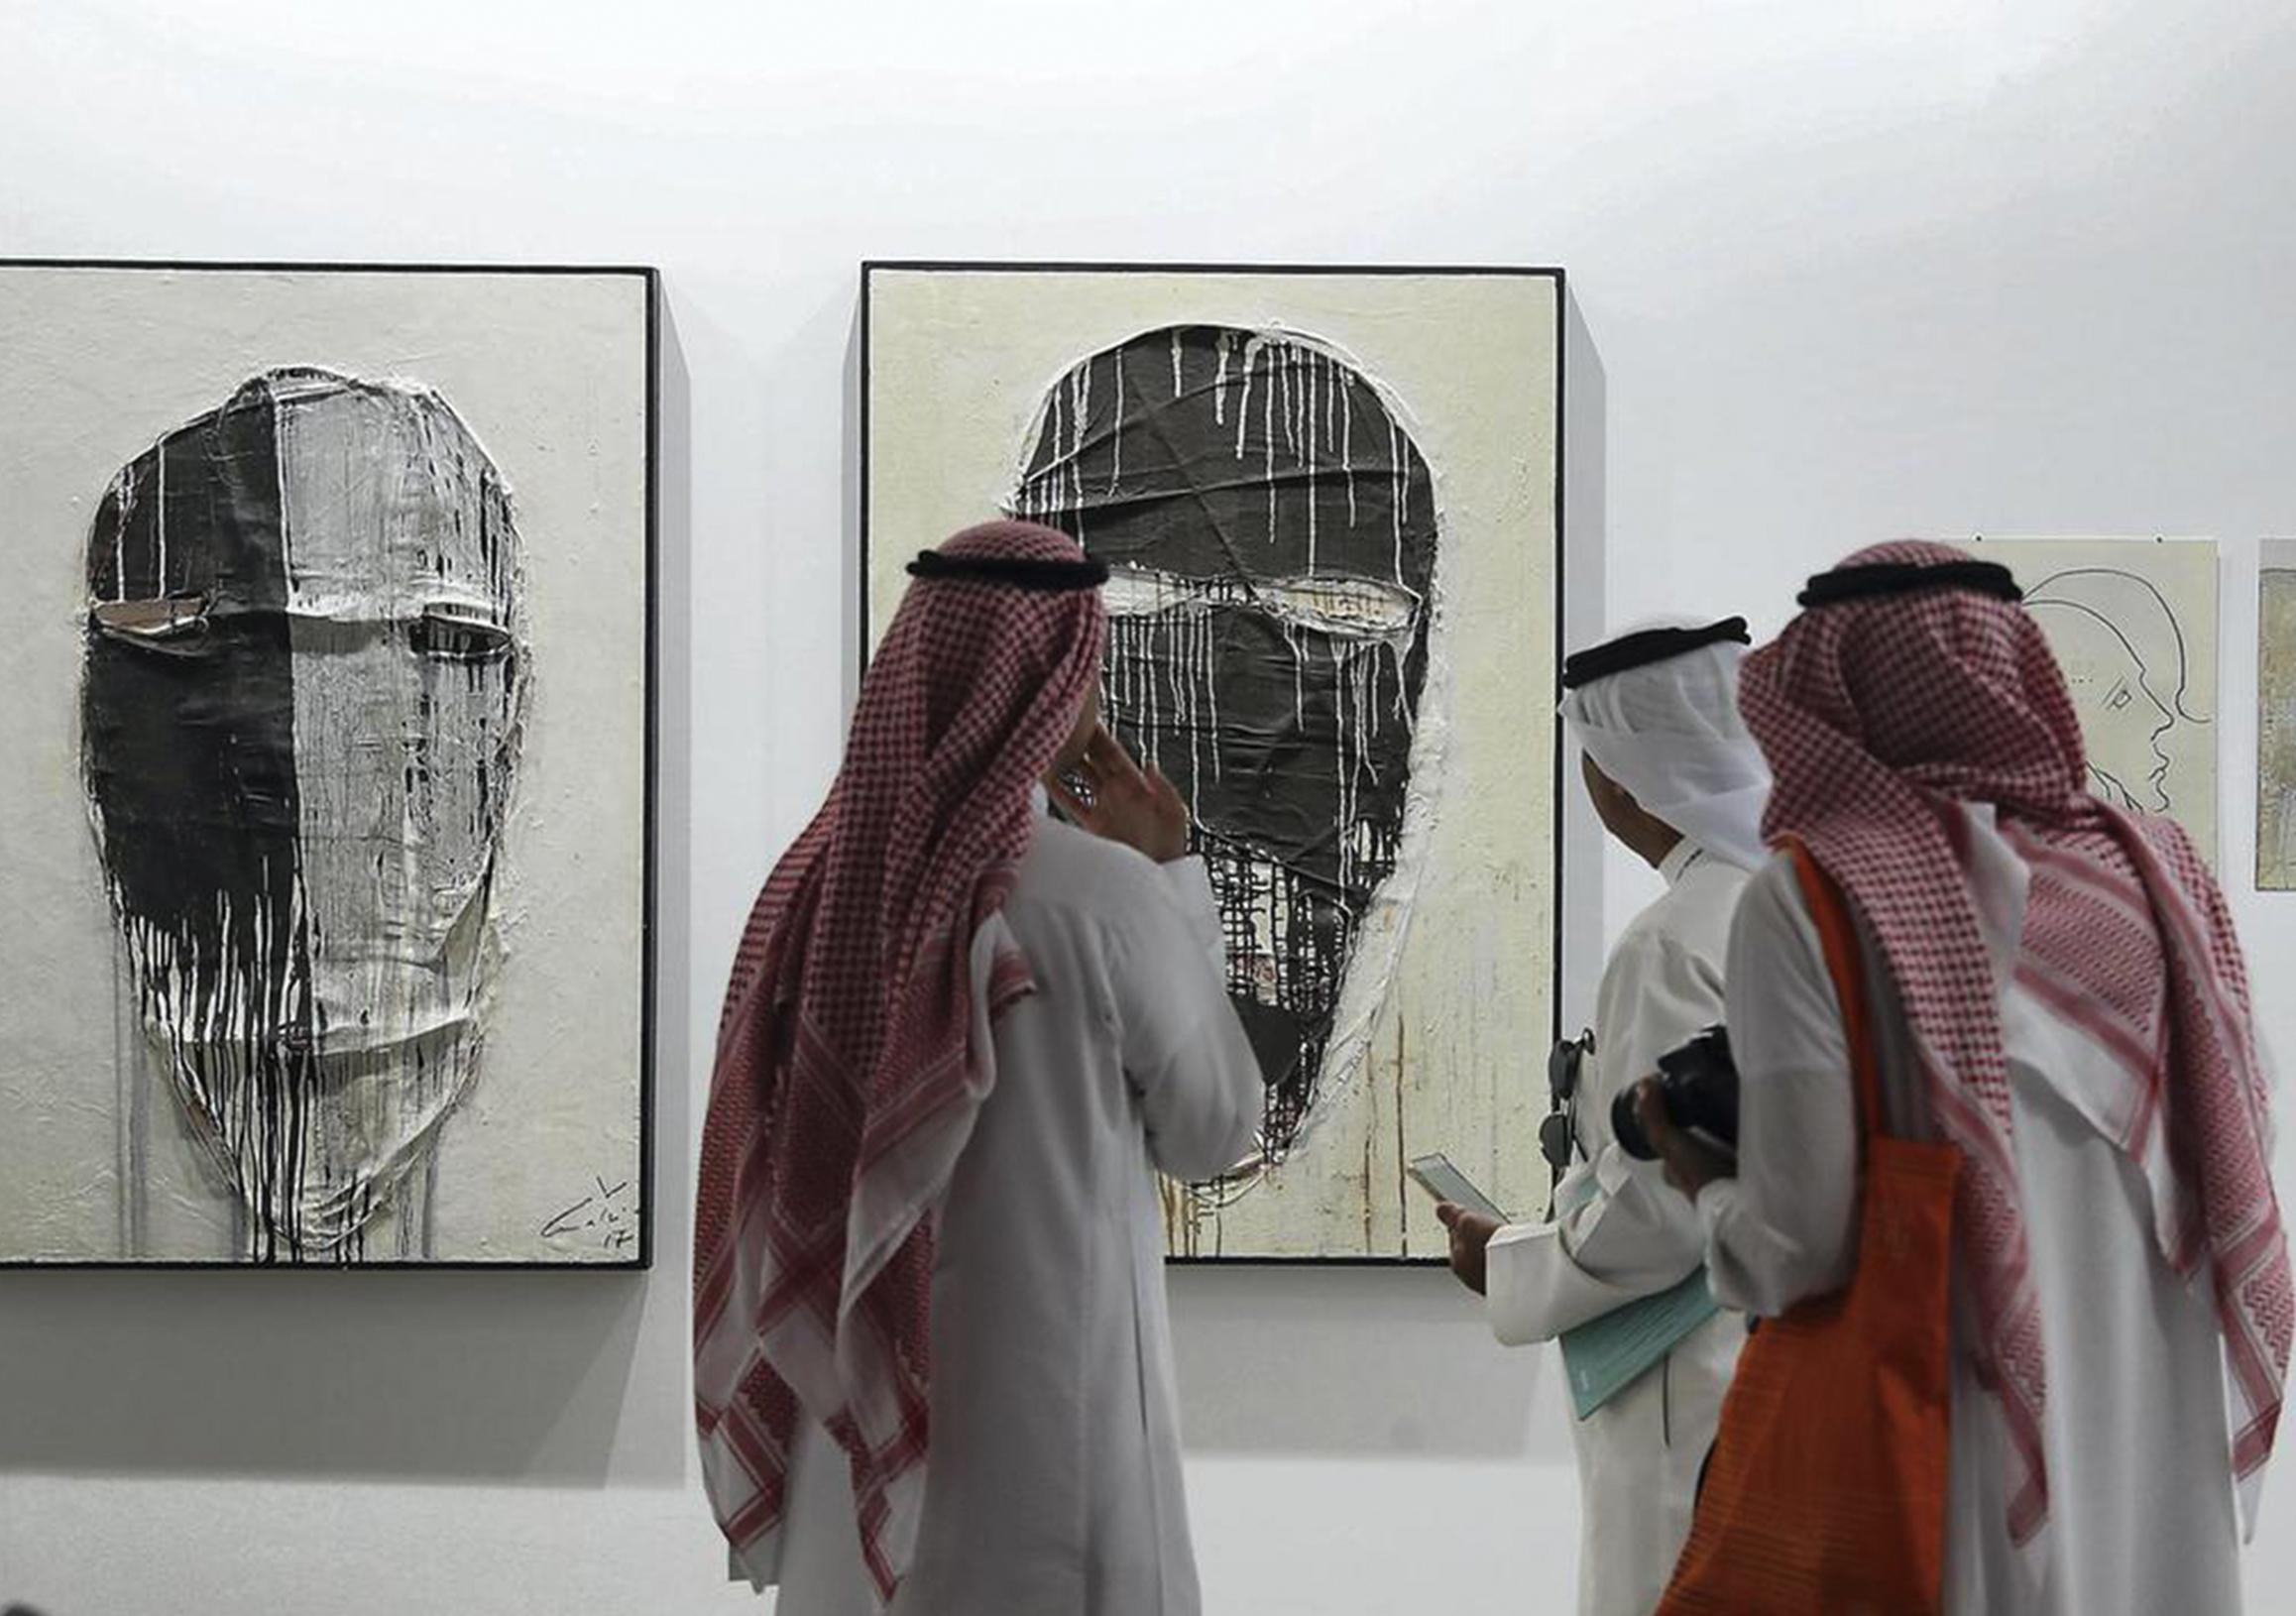 Photo: Visitors study the works on display during Art Dubai at Madinat Jumeirah. Pawan Singh / The National.